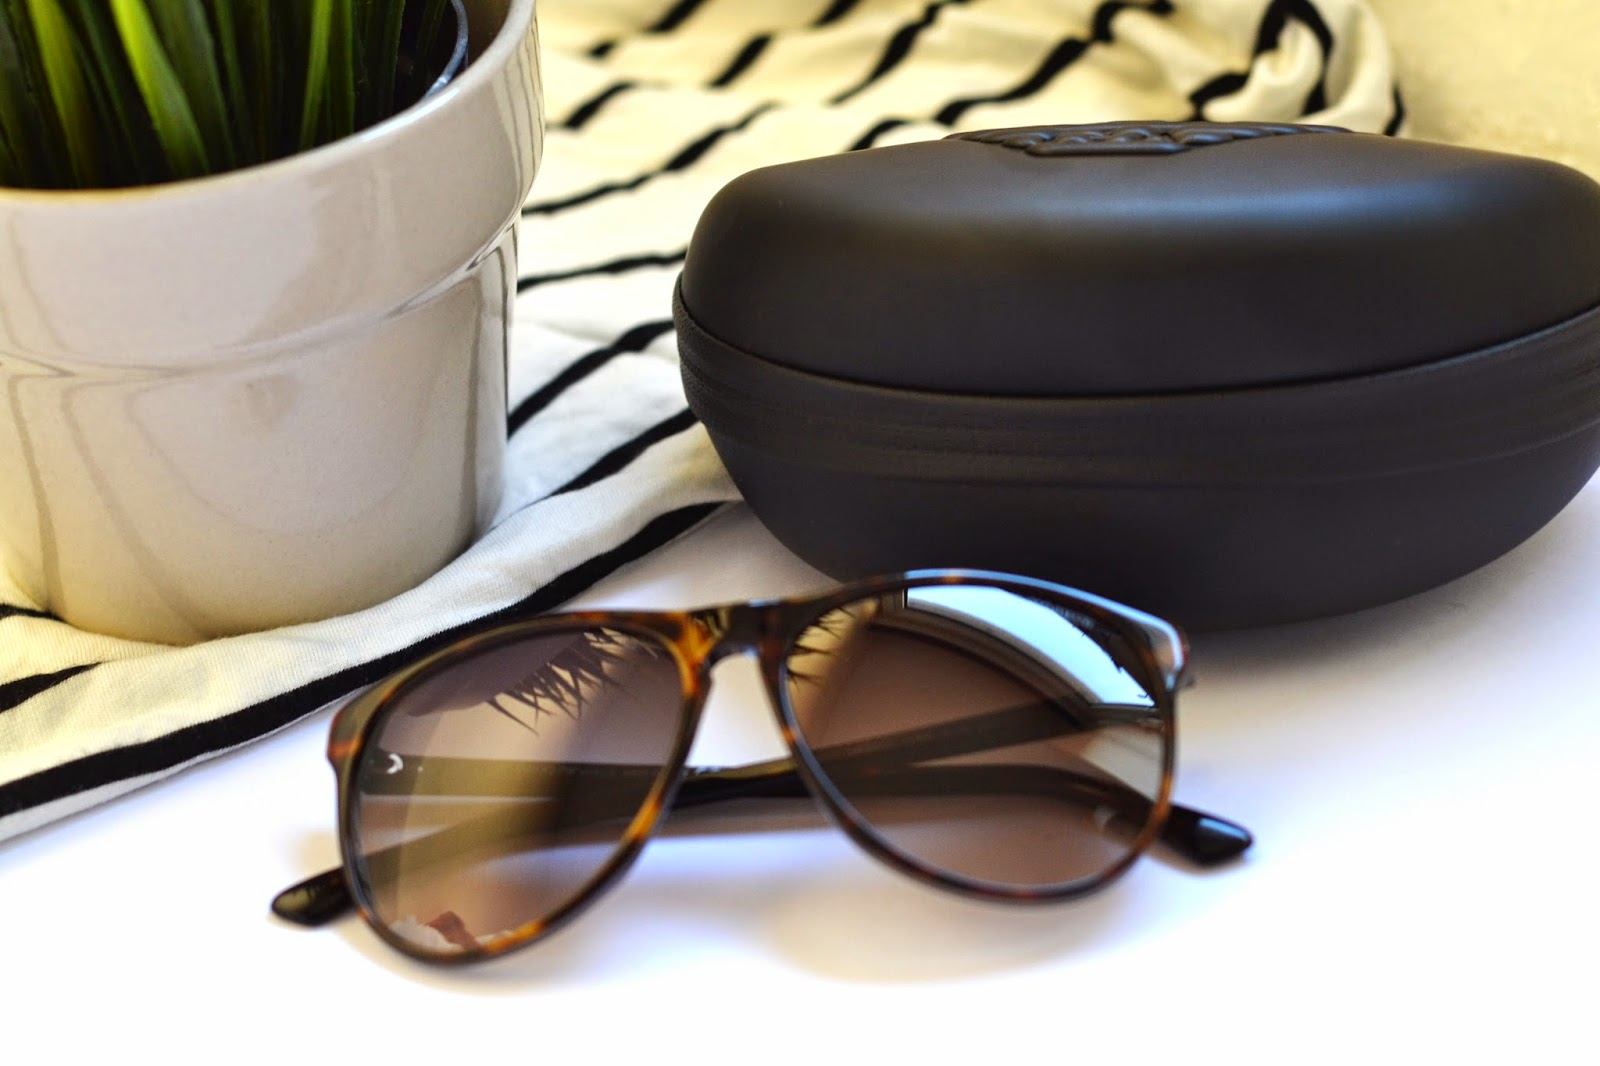 armani sunglasses 2